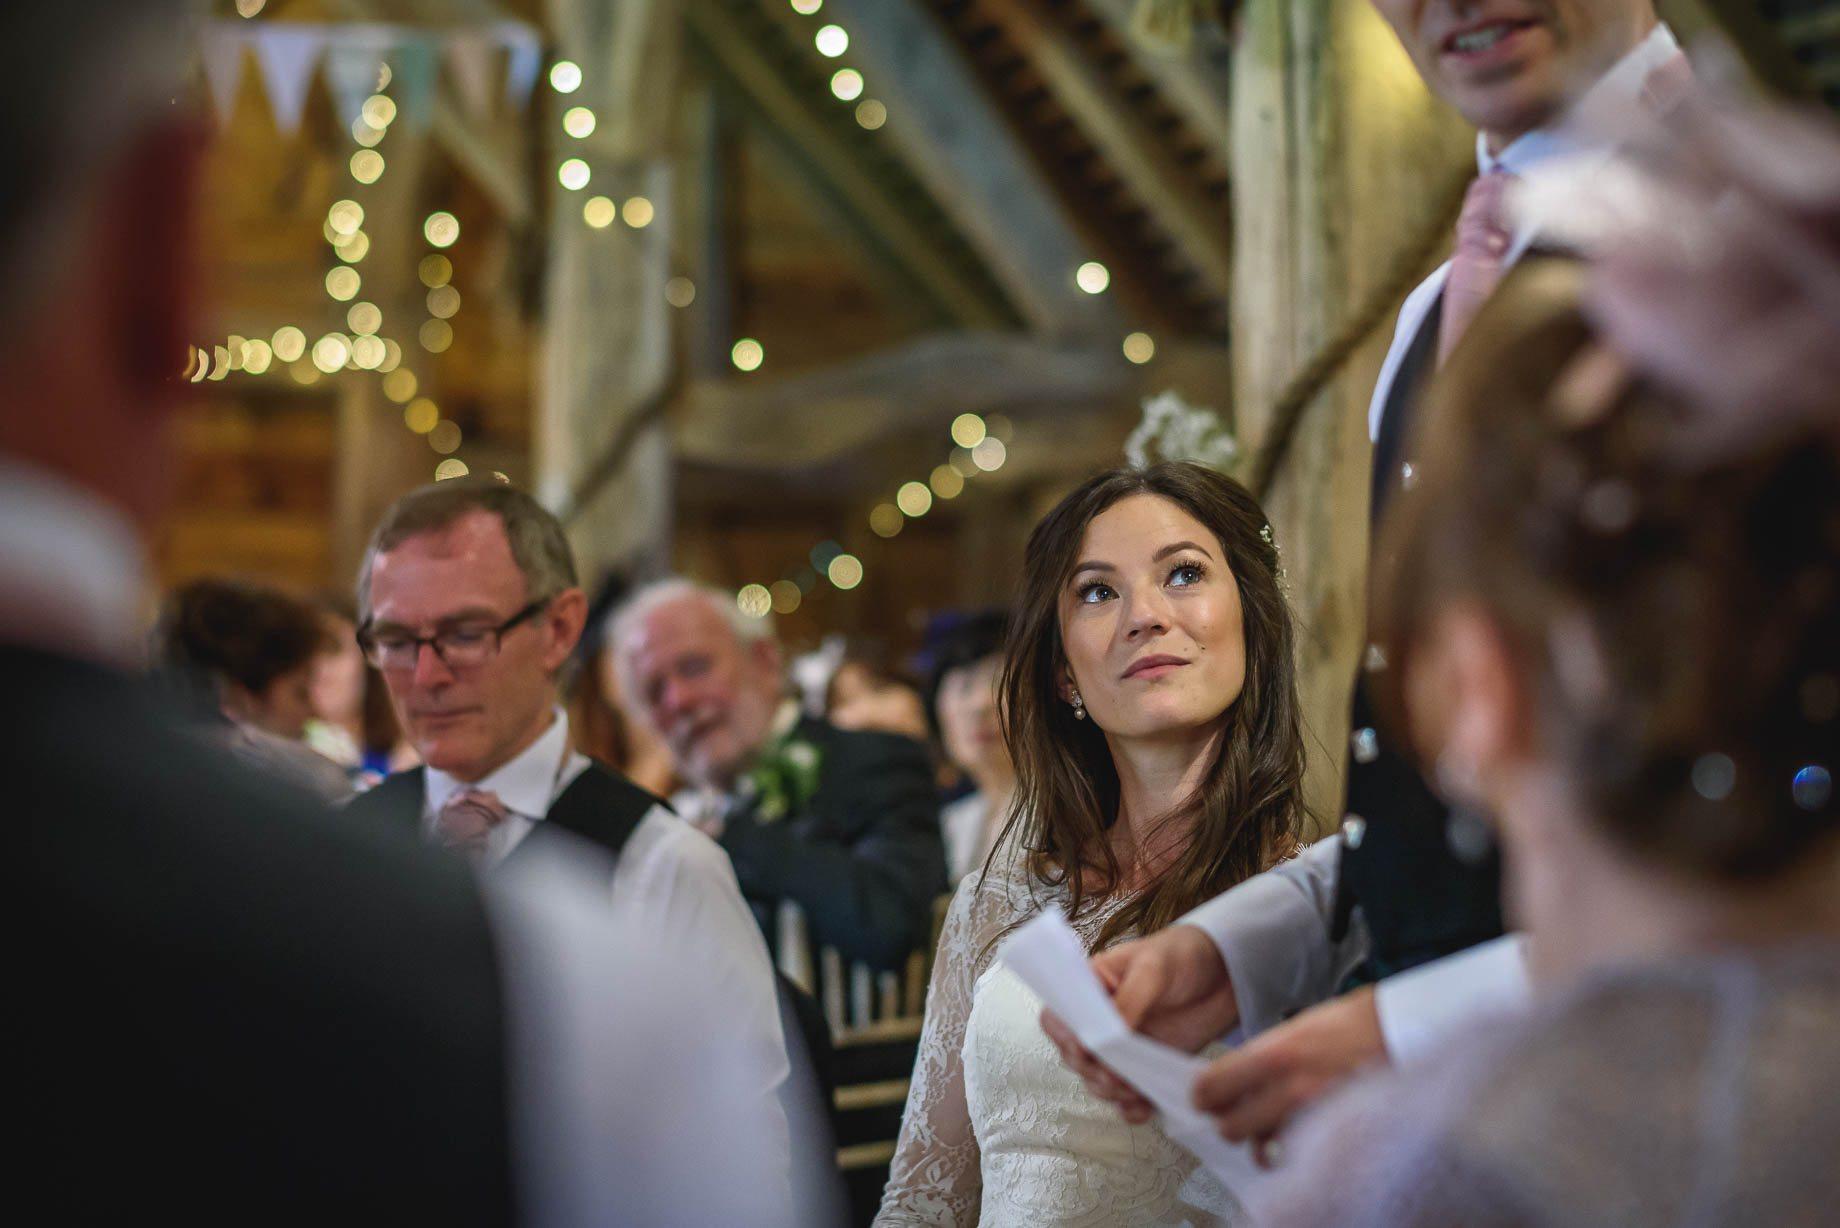 Gildings Barn wedding photography - Sarah and Steve (140 of 190)